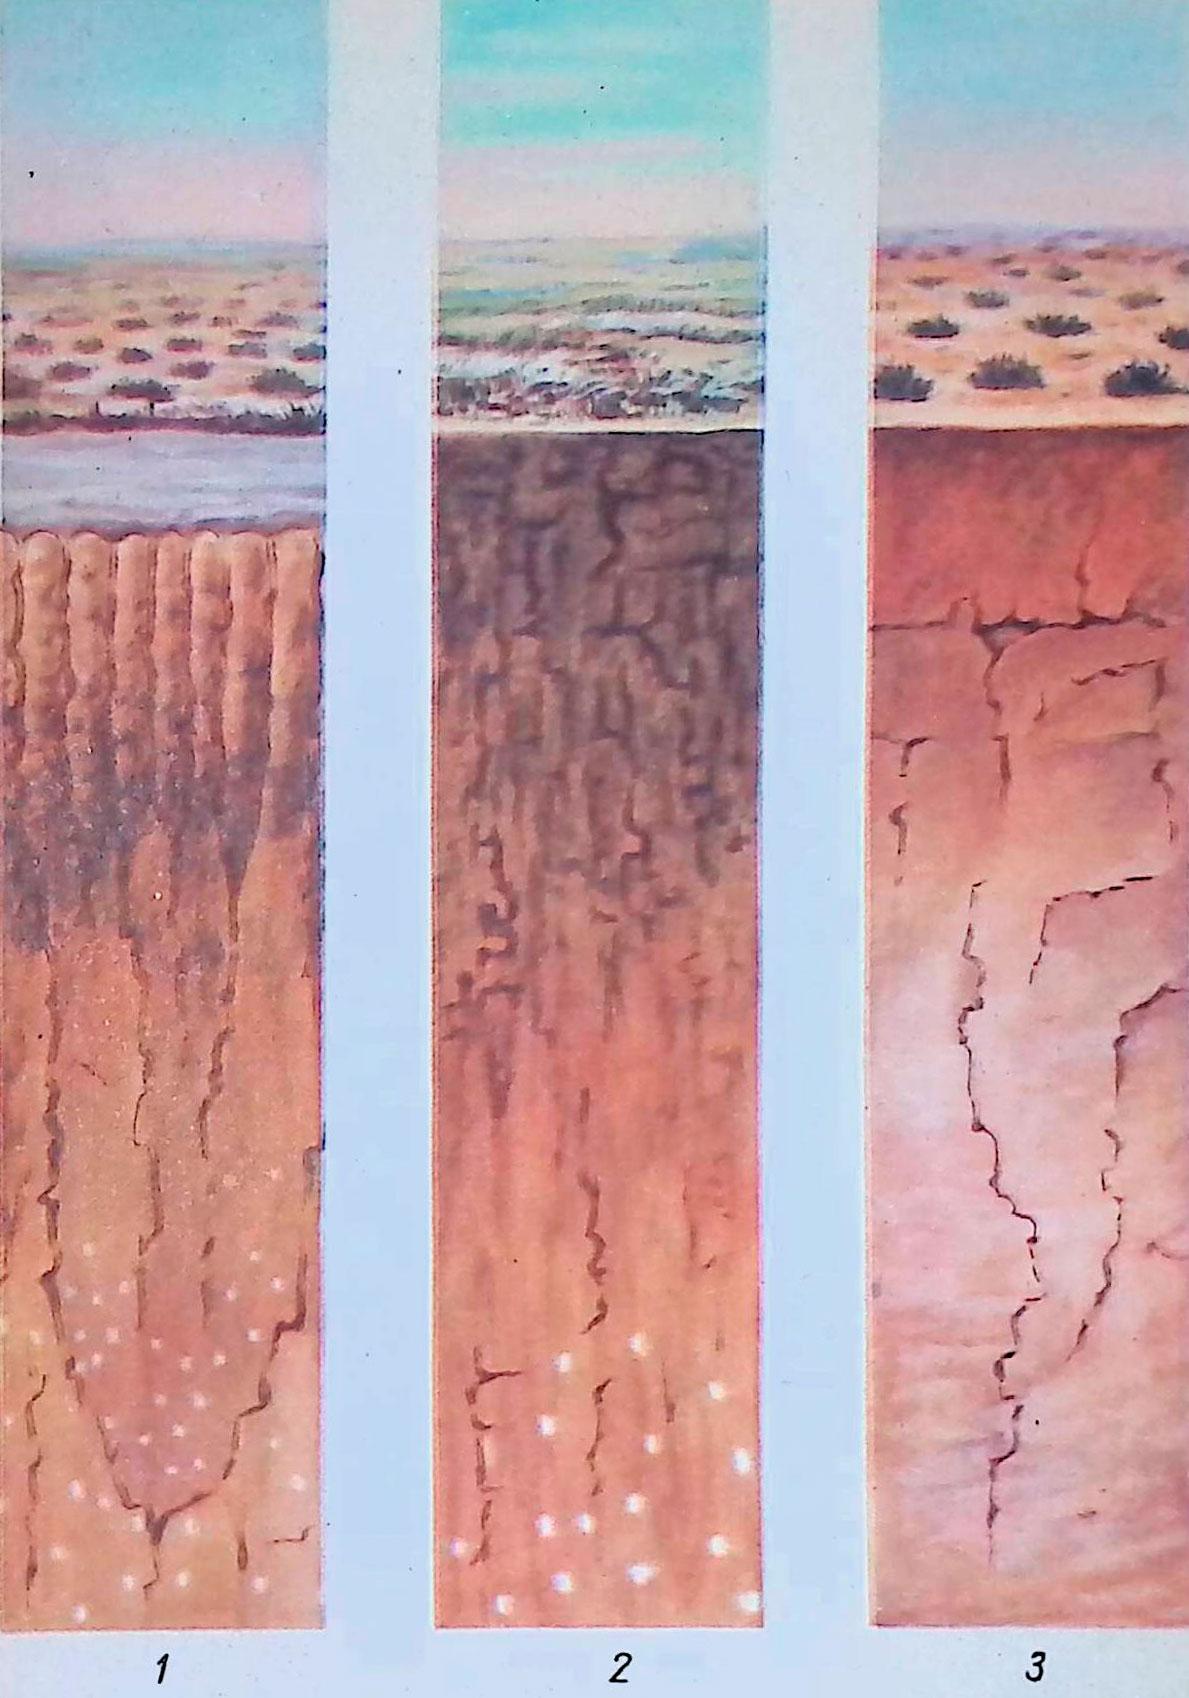 1—солонец; 2— каштановая почва; 3—бурая почва